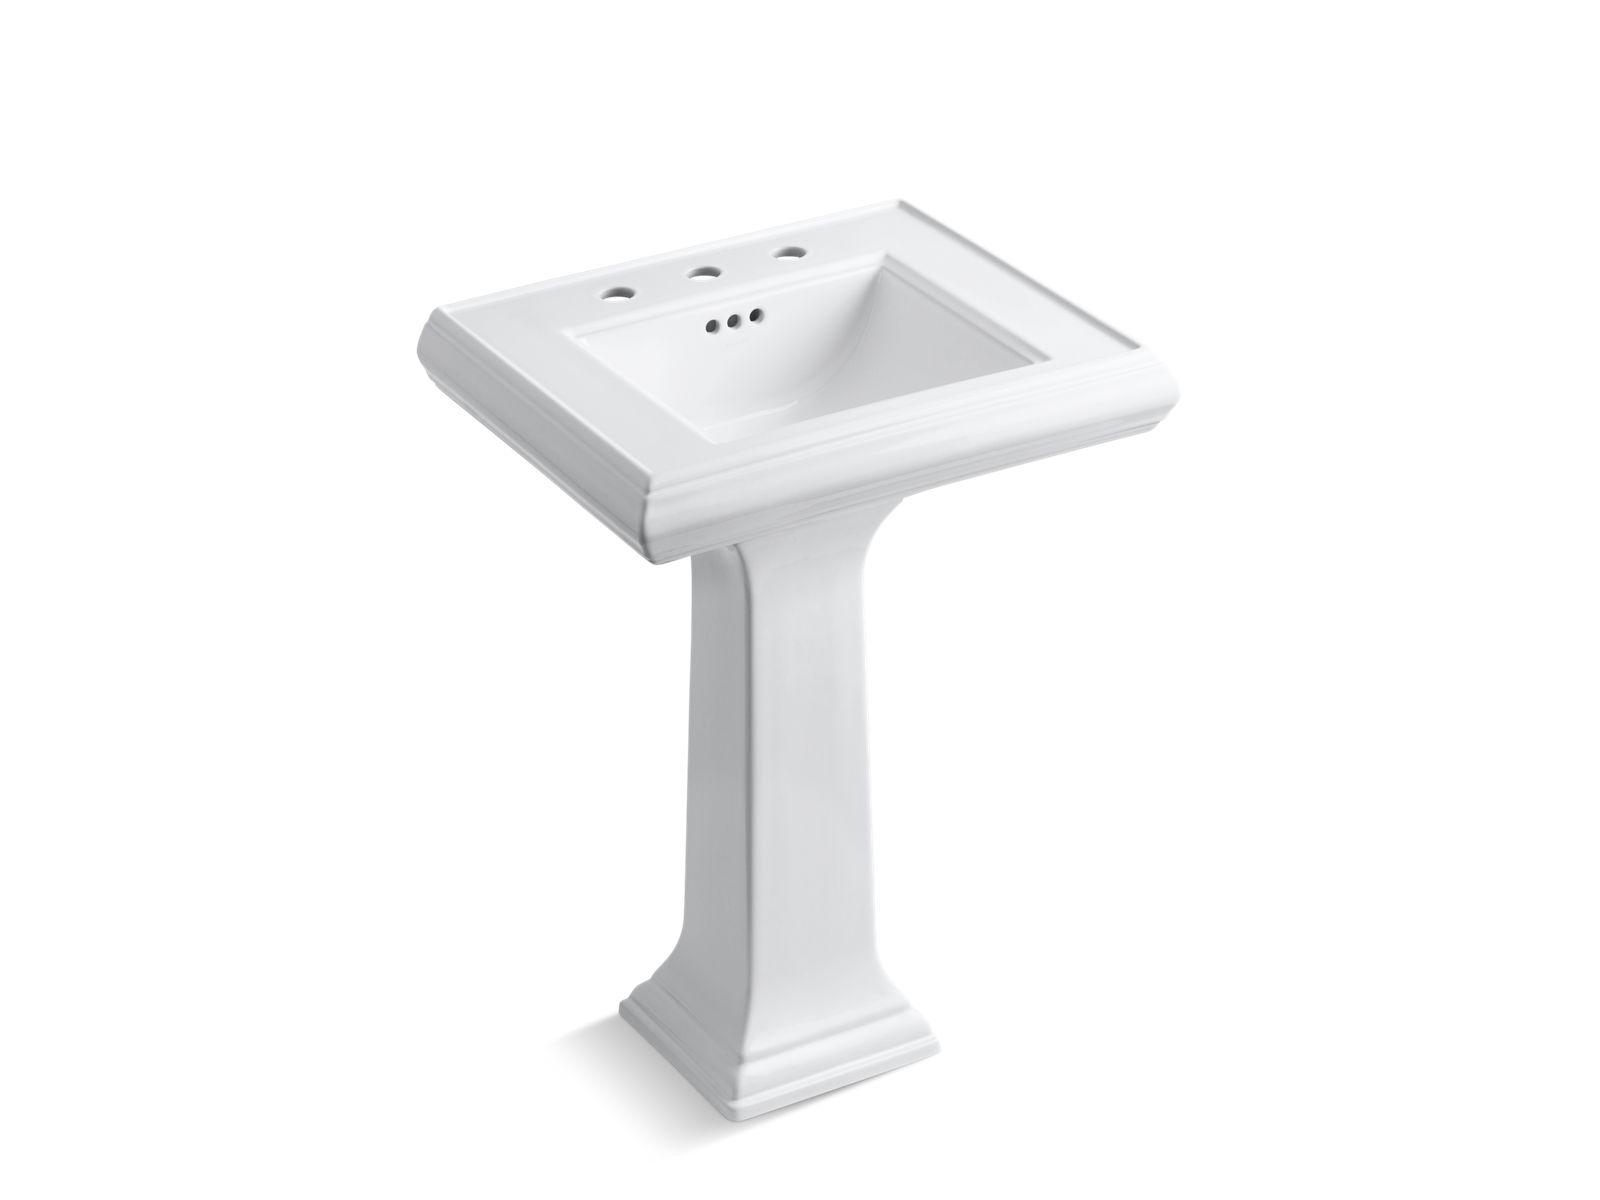 Bathroom Sink Installation Bathroom Sinks Guide KOHLER